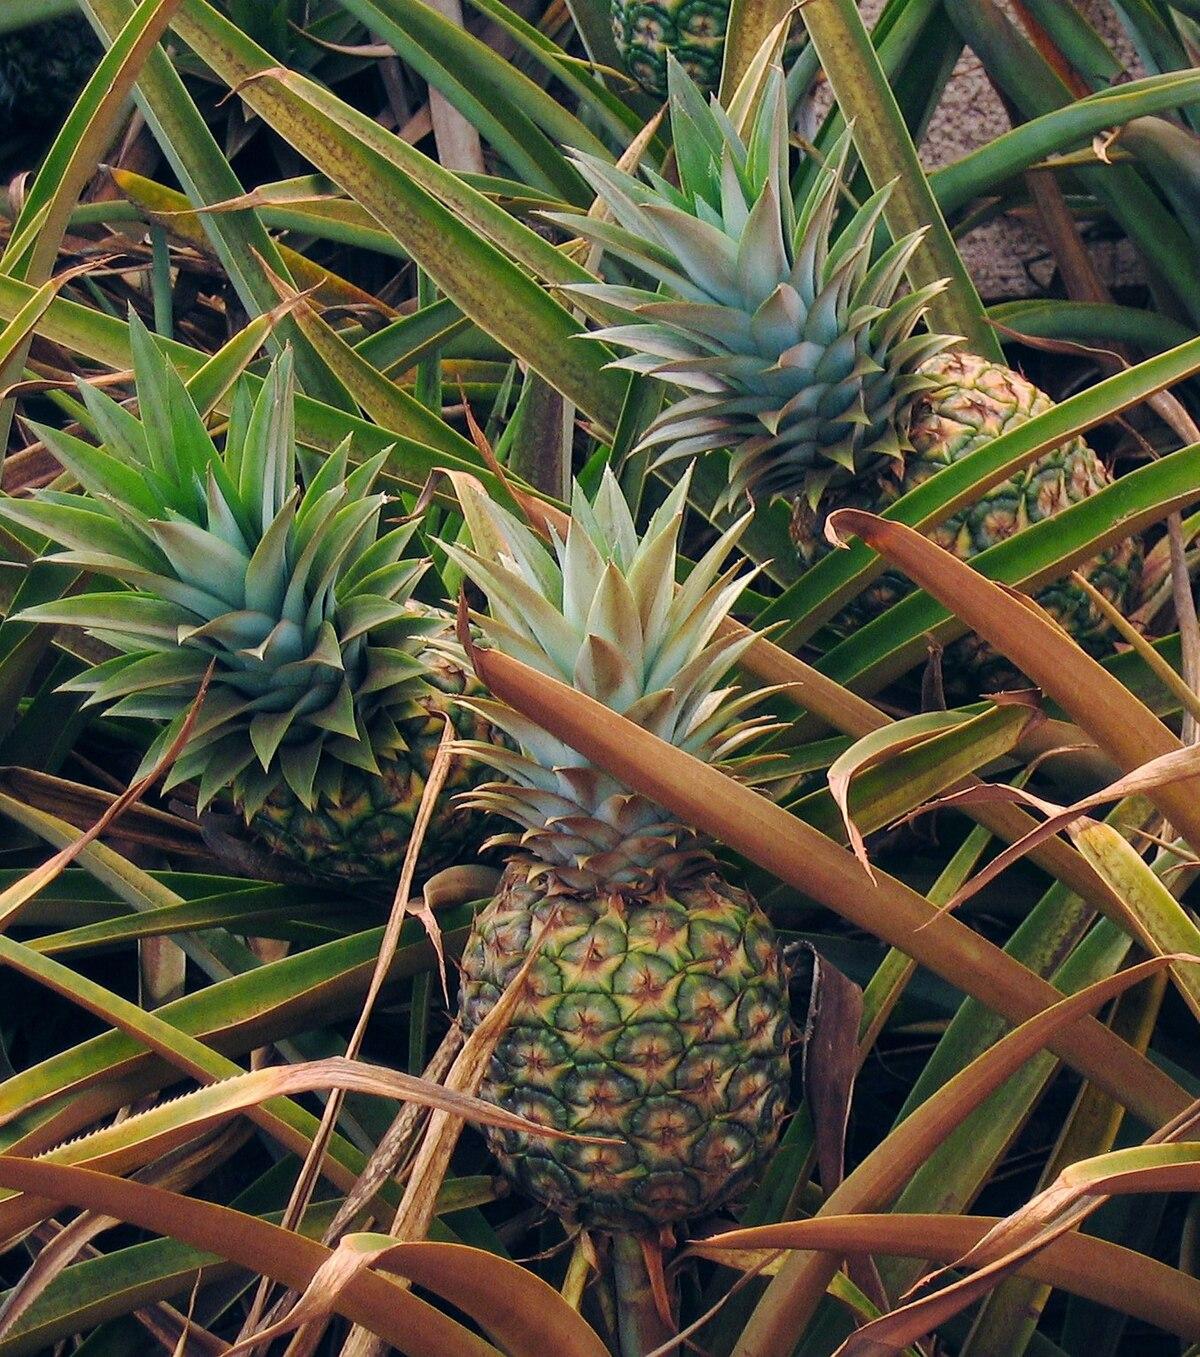 Ananas (Ananas comosus), Ananaspflanze mit reifer Frucht